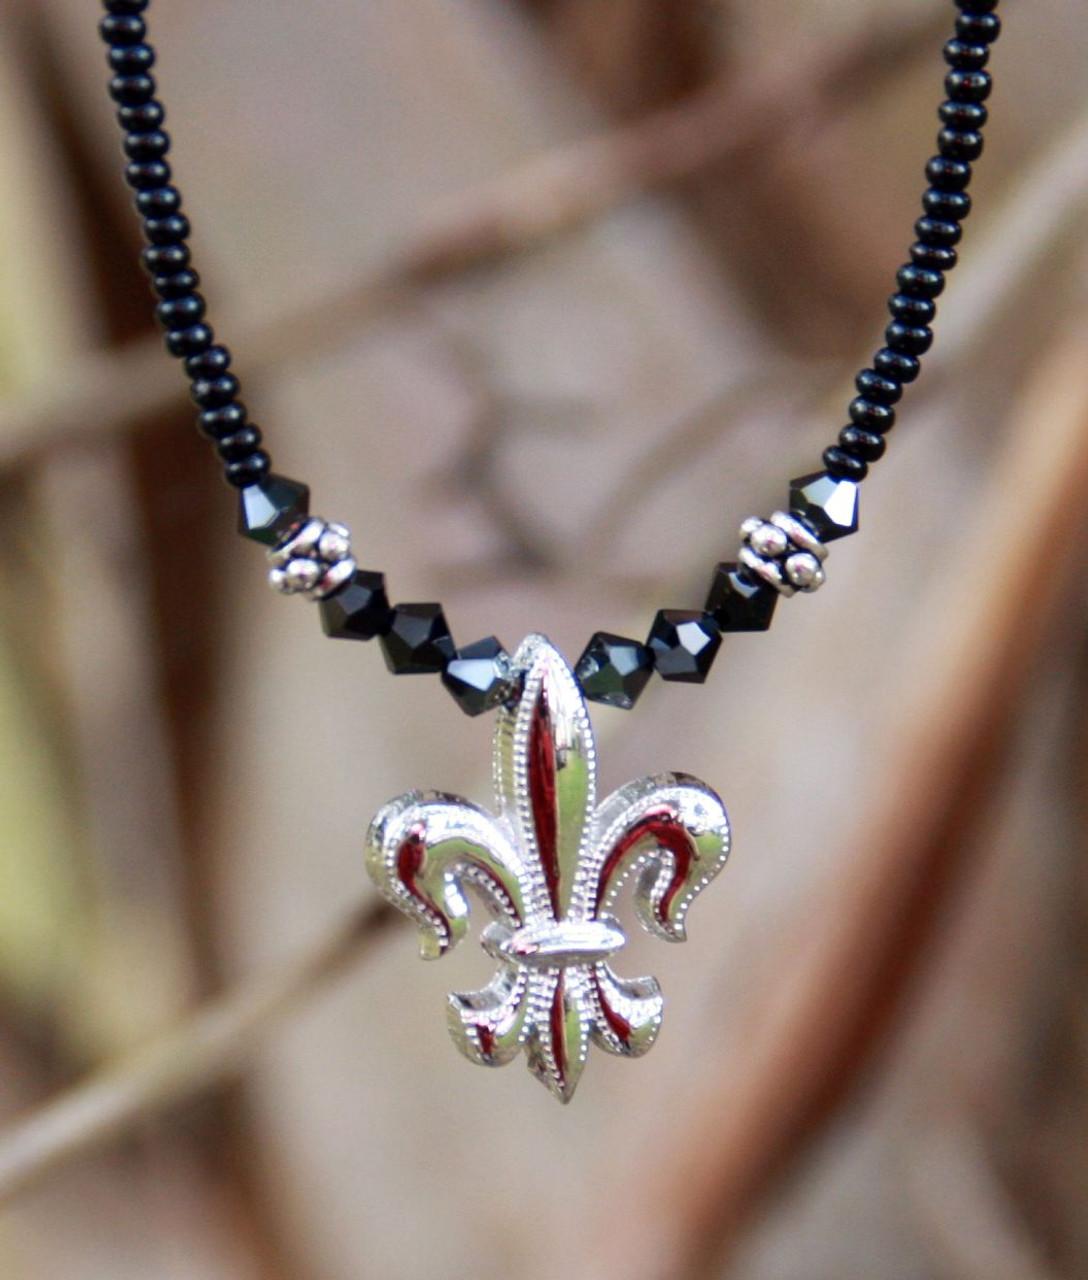 NCK-84 Fleur de Lis Black and Silver Beaded Necklace